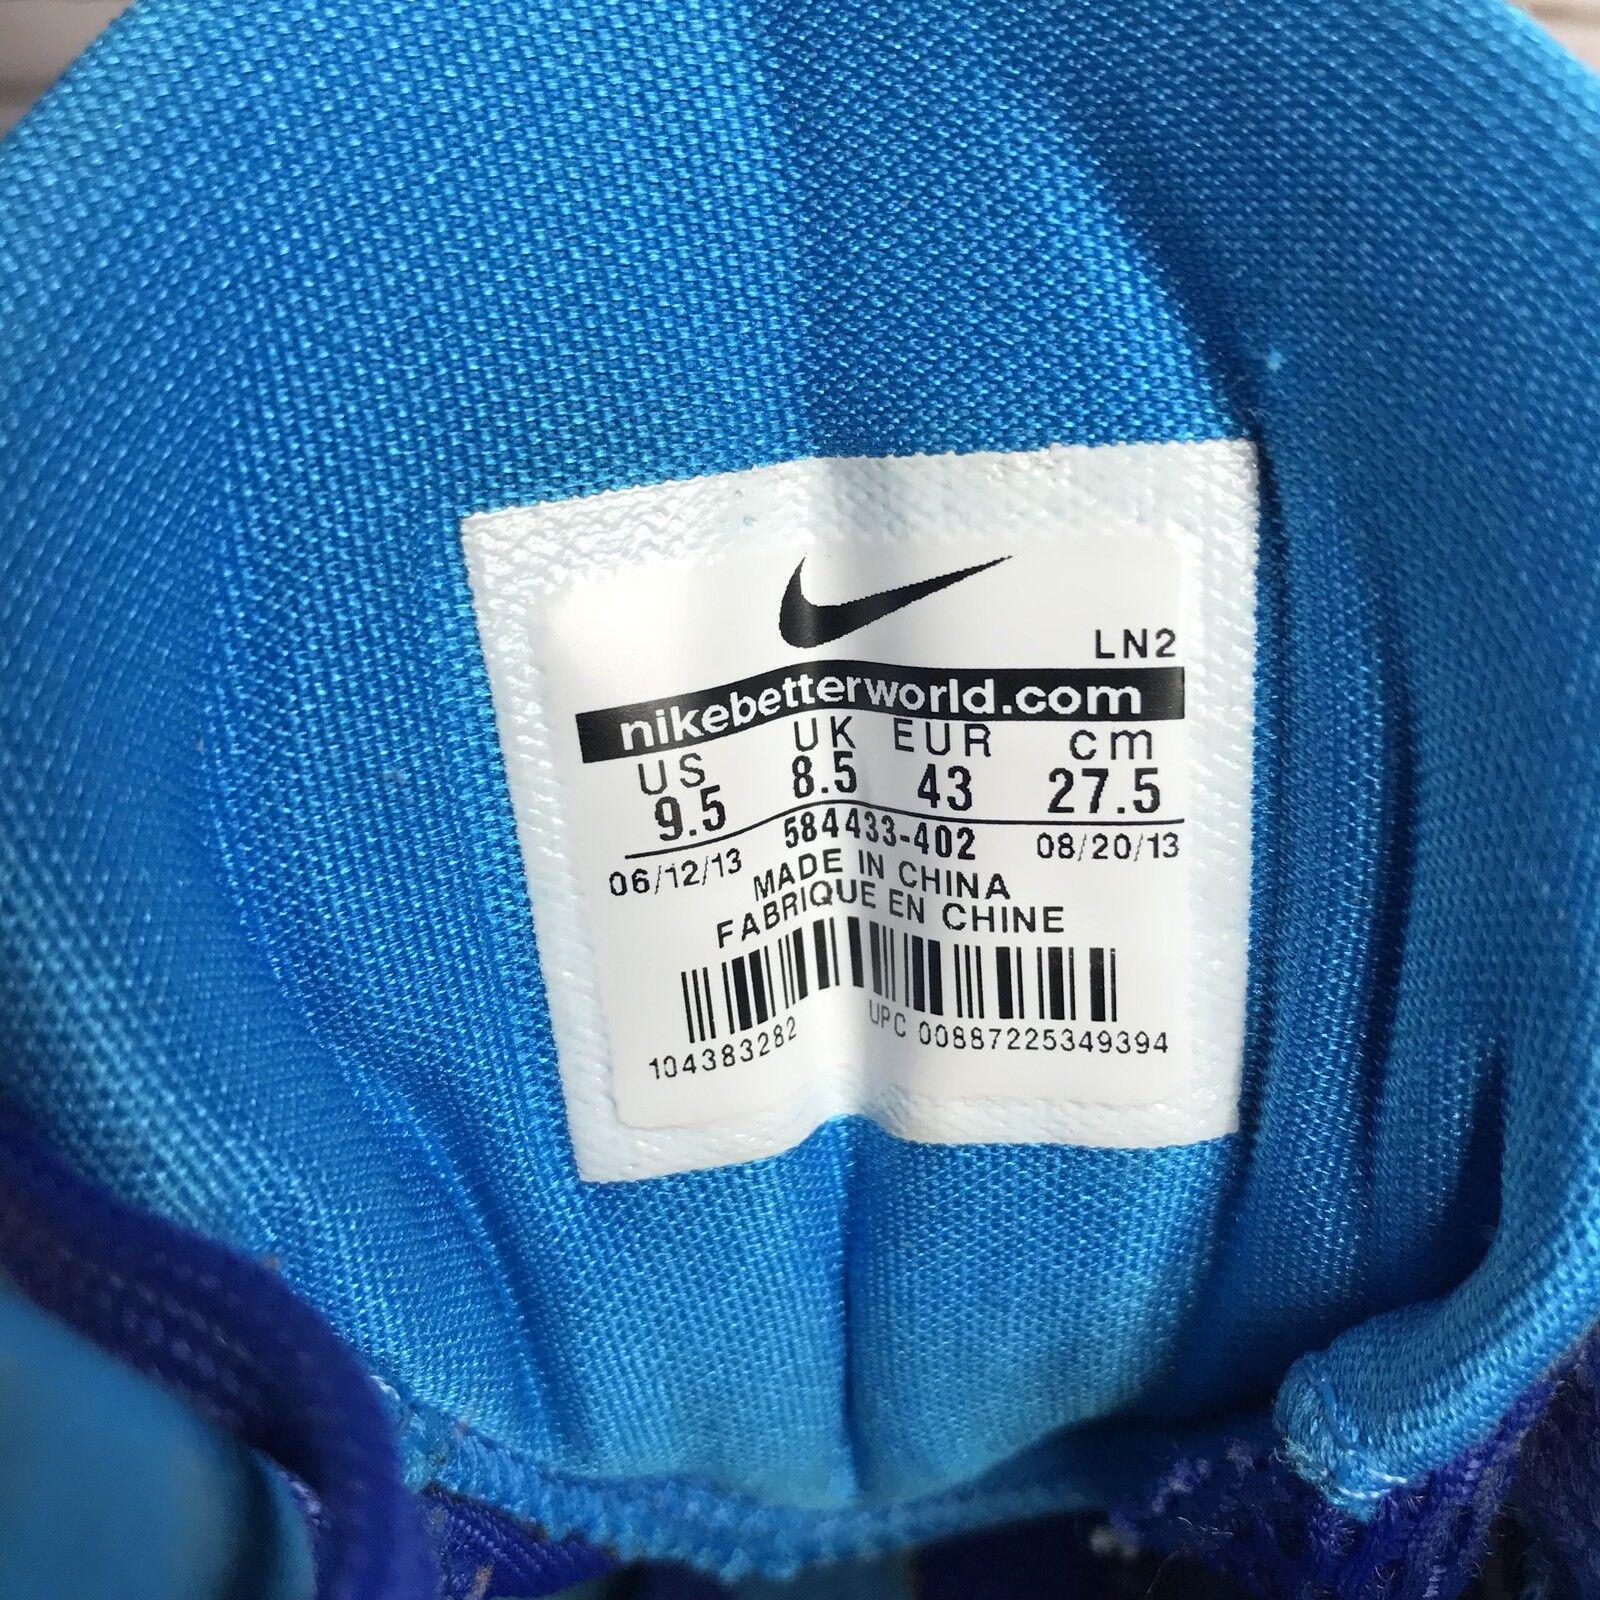 Nike Hyperdunk 2013 Men Basketball shoes shoes shoes 584433-402 bluee High Top Sneaker Sz 9.5 b4bbd8